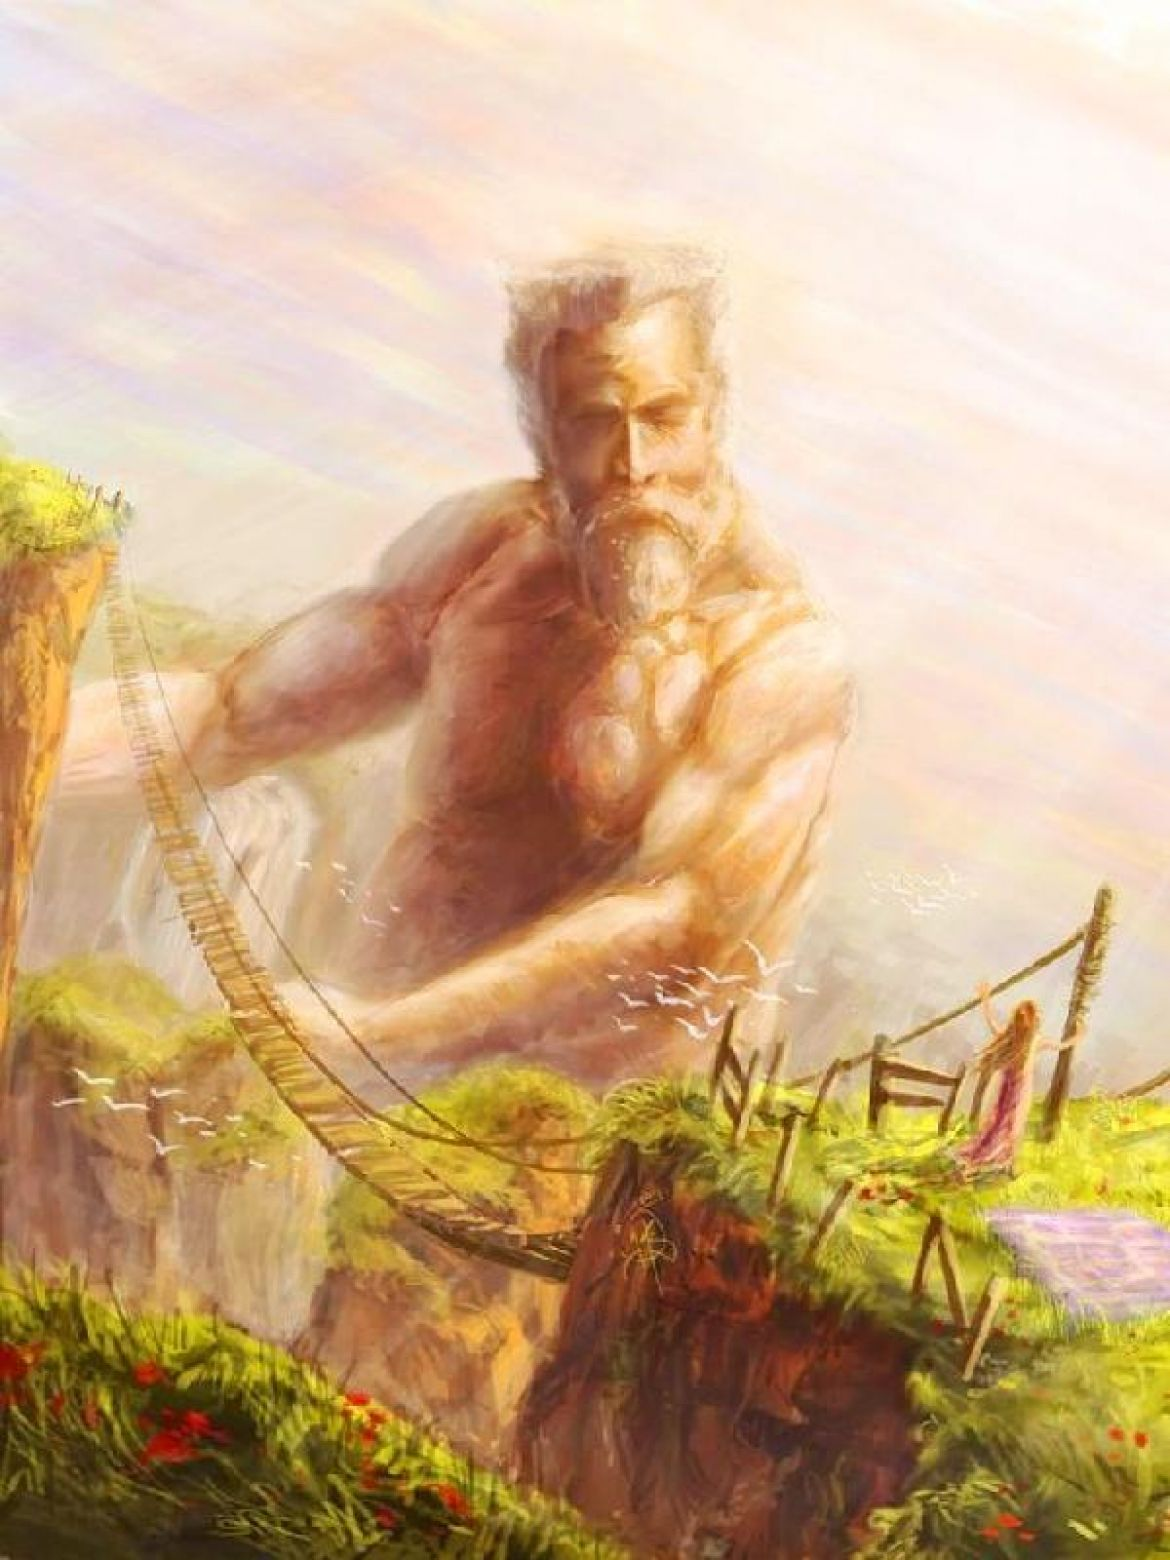 Картинки про великана